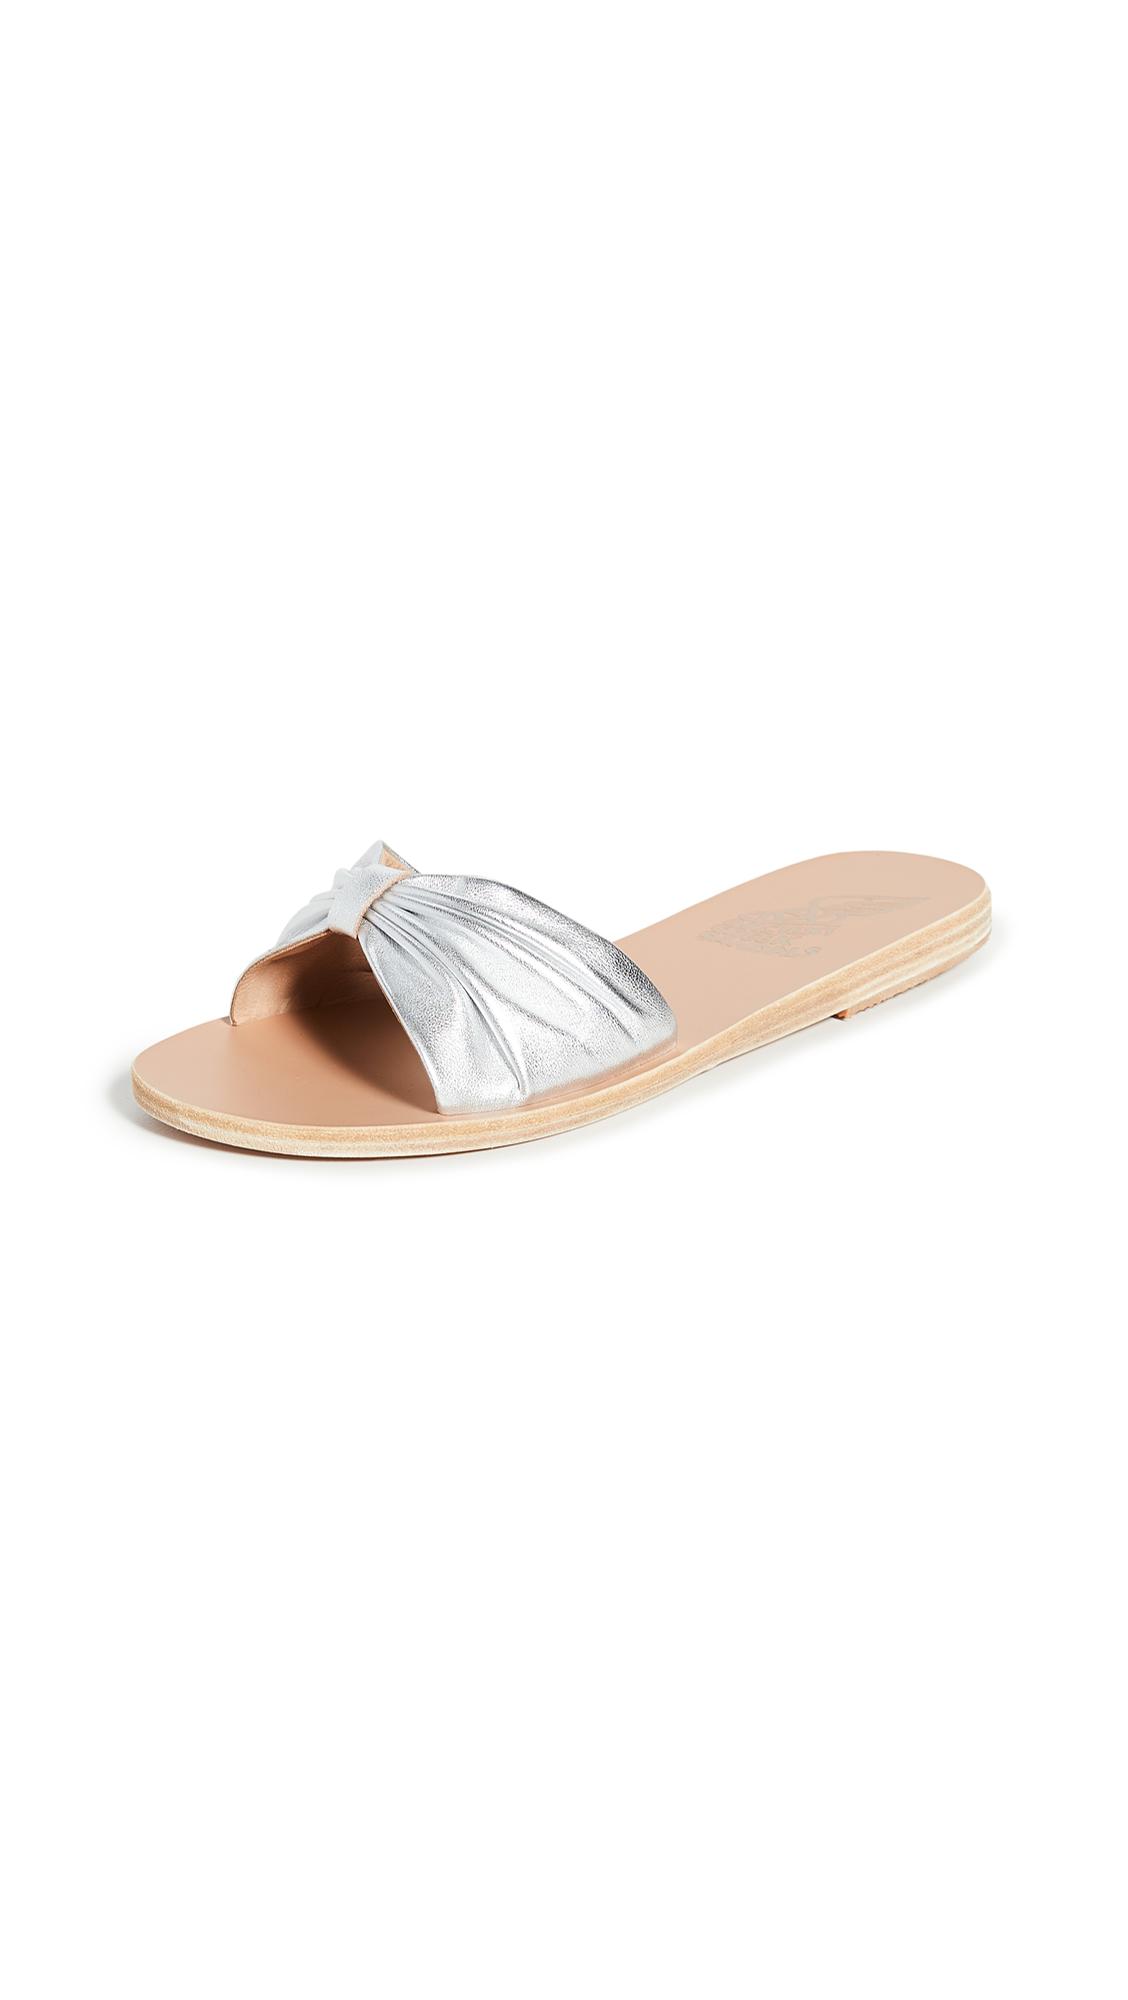 Buy Ancient Greek Sandals Mimi Bow Slides online, shop Ancient Greek Sandals